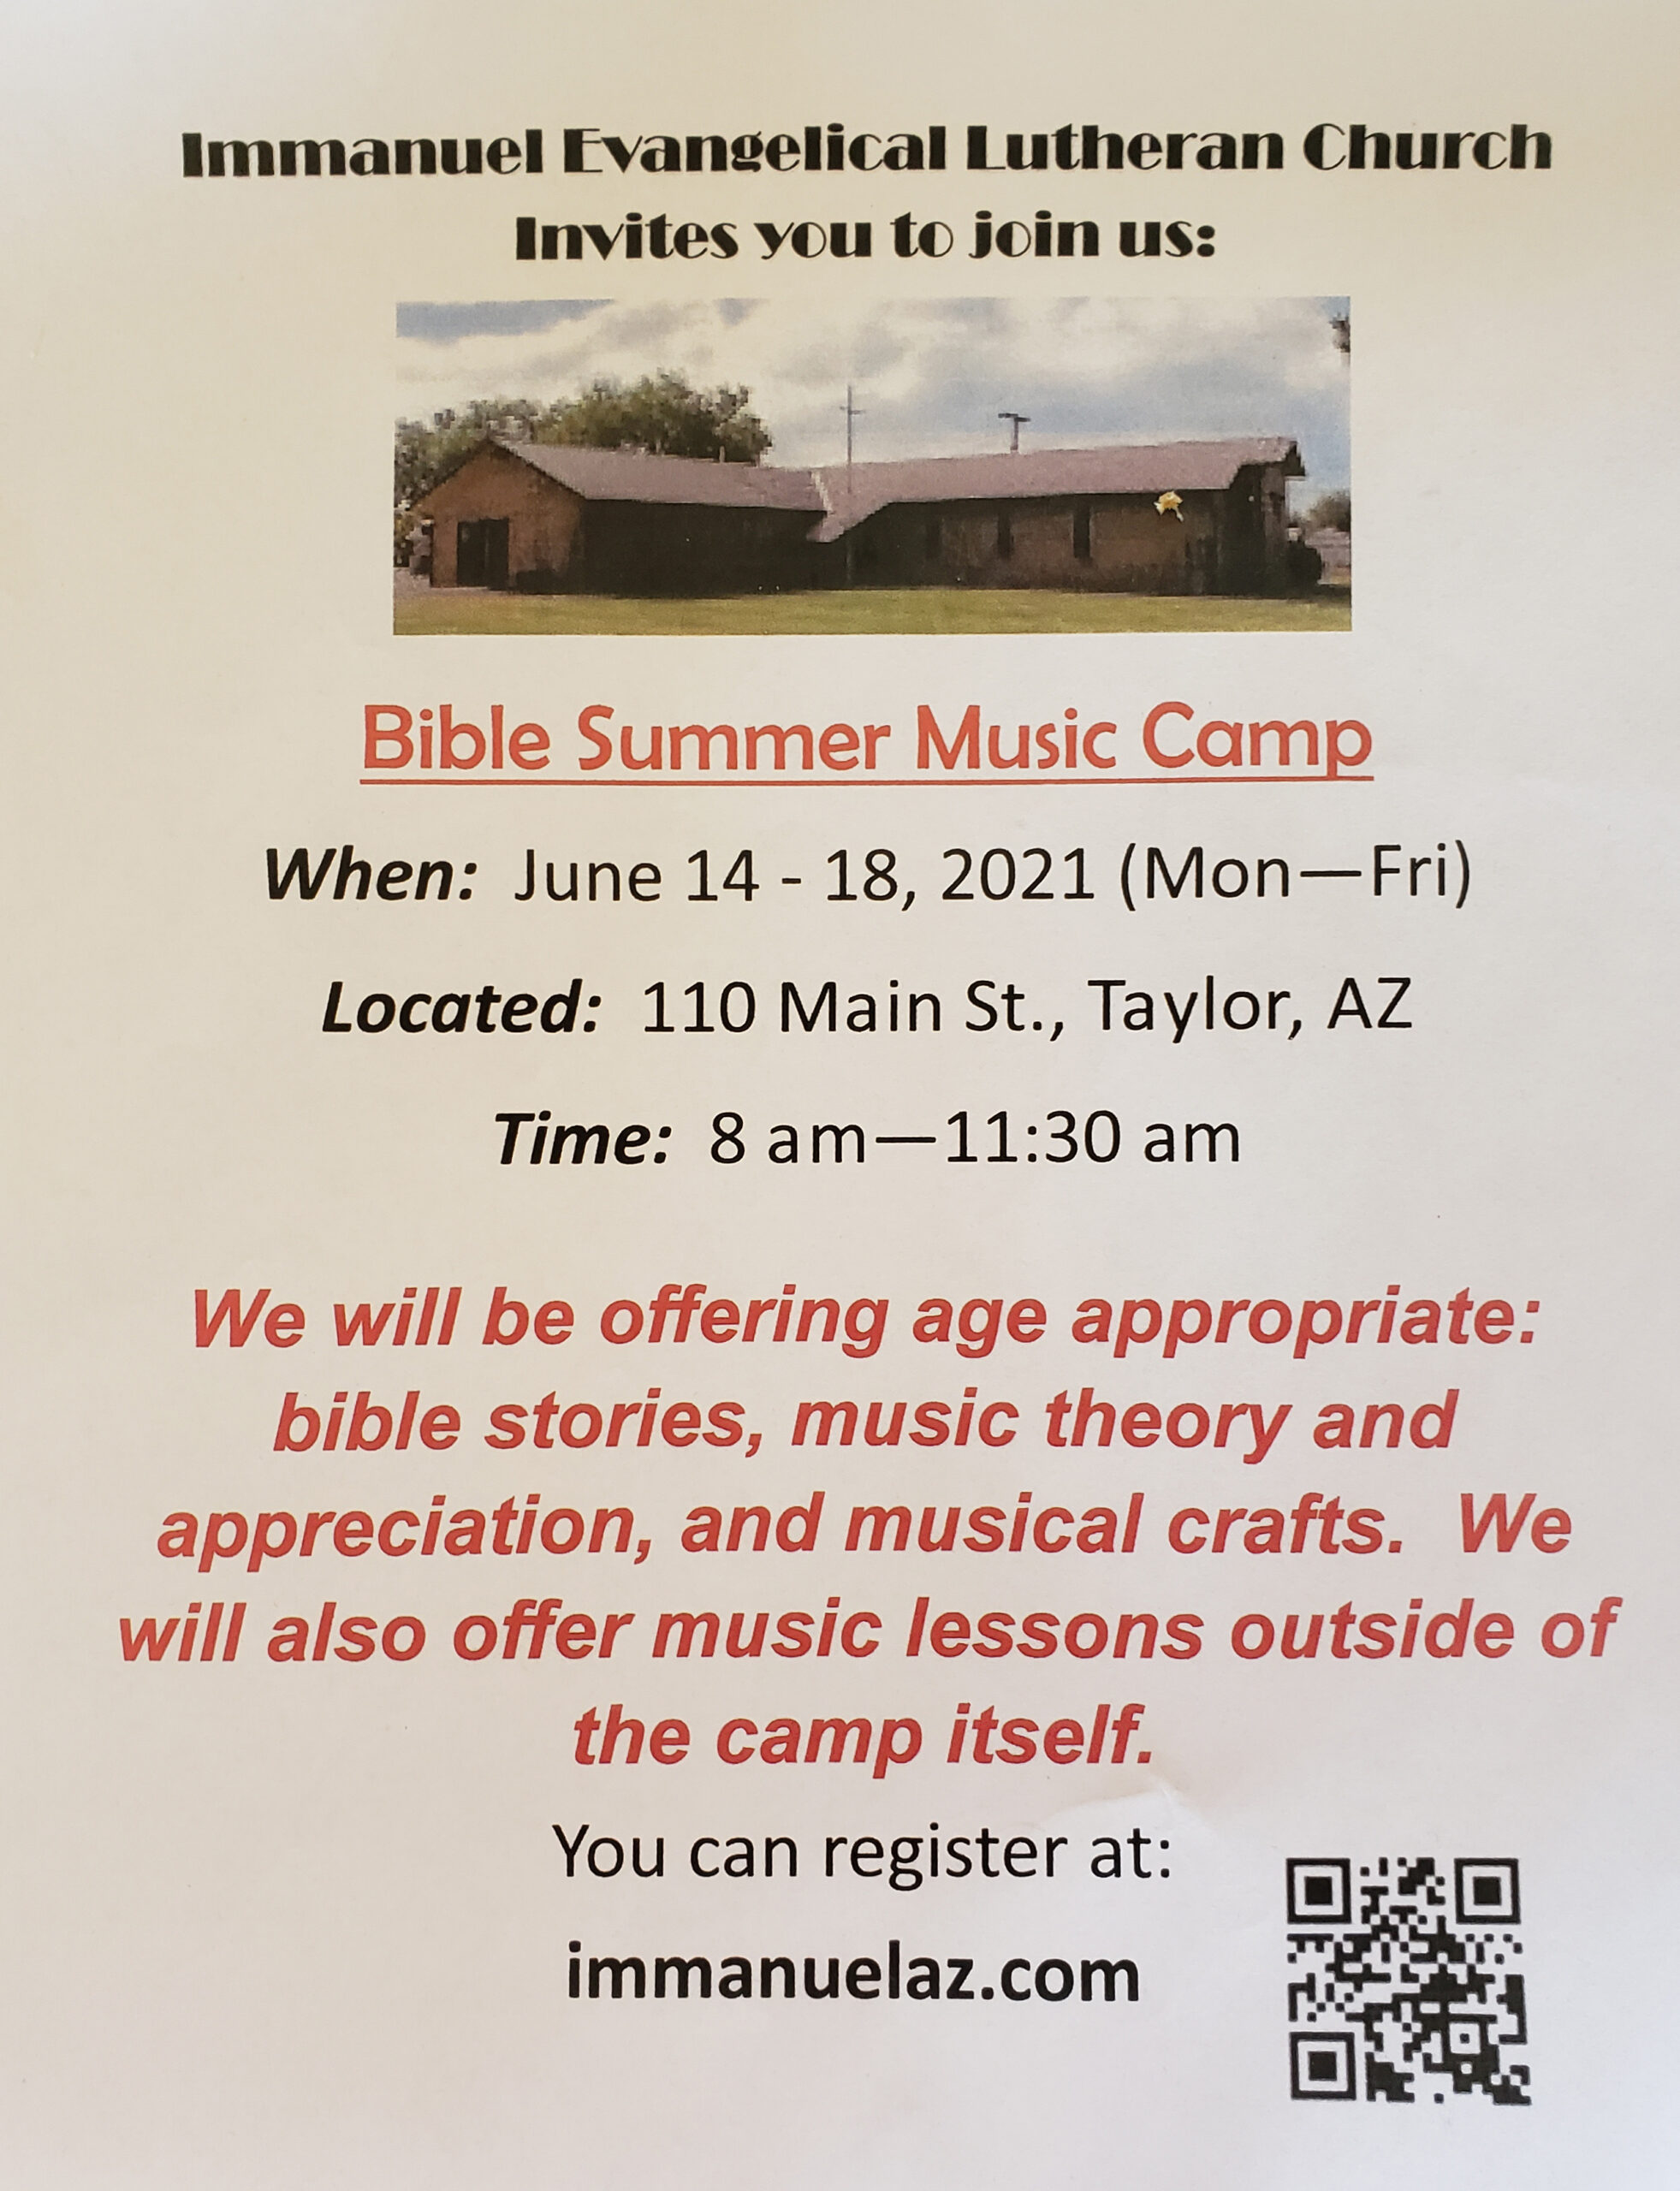 Bible Summer Music Camp @ Immanuel Evangelical Lutheran Church | Taylor | Arizona | United States